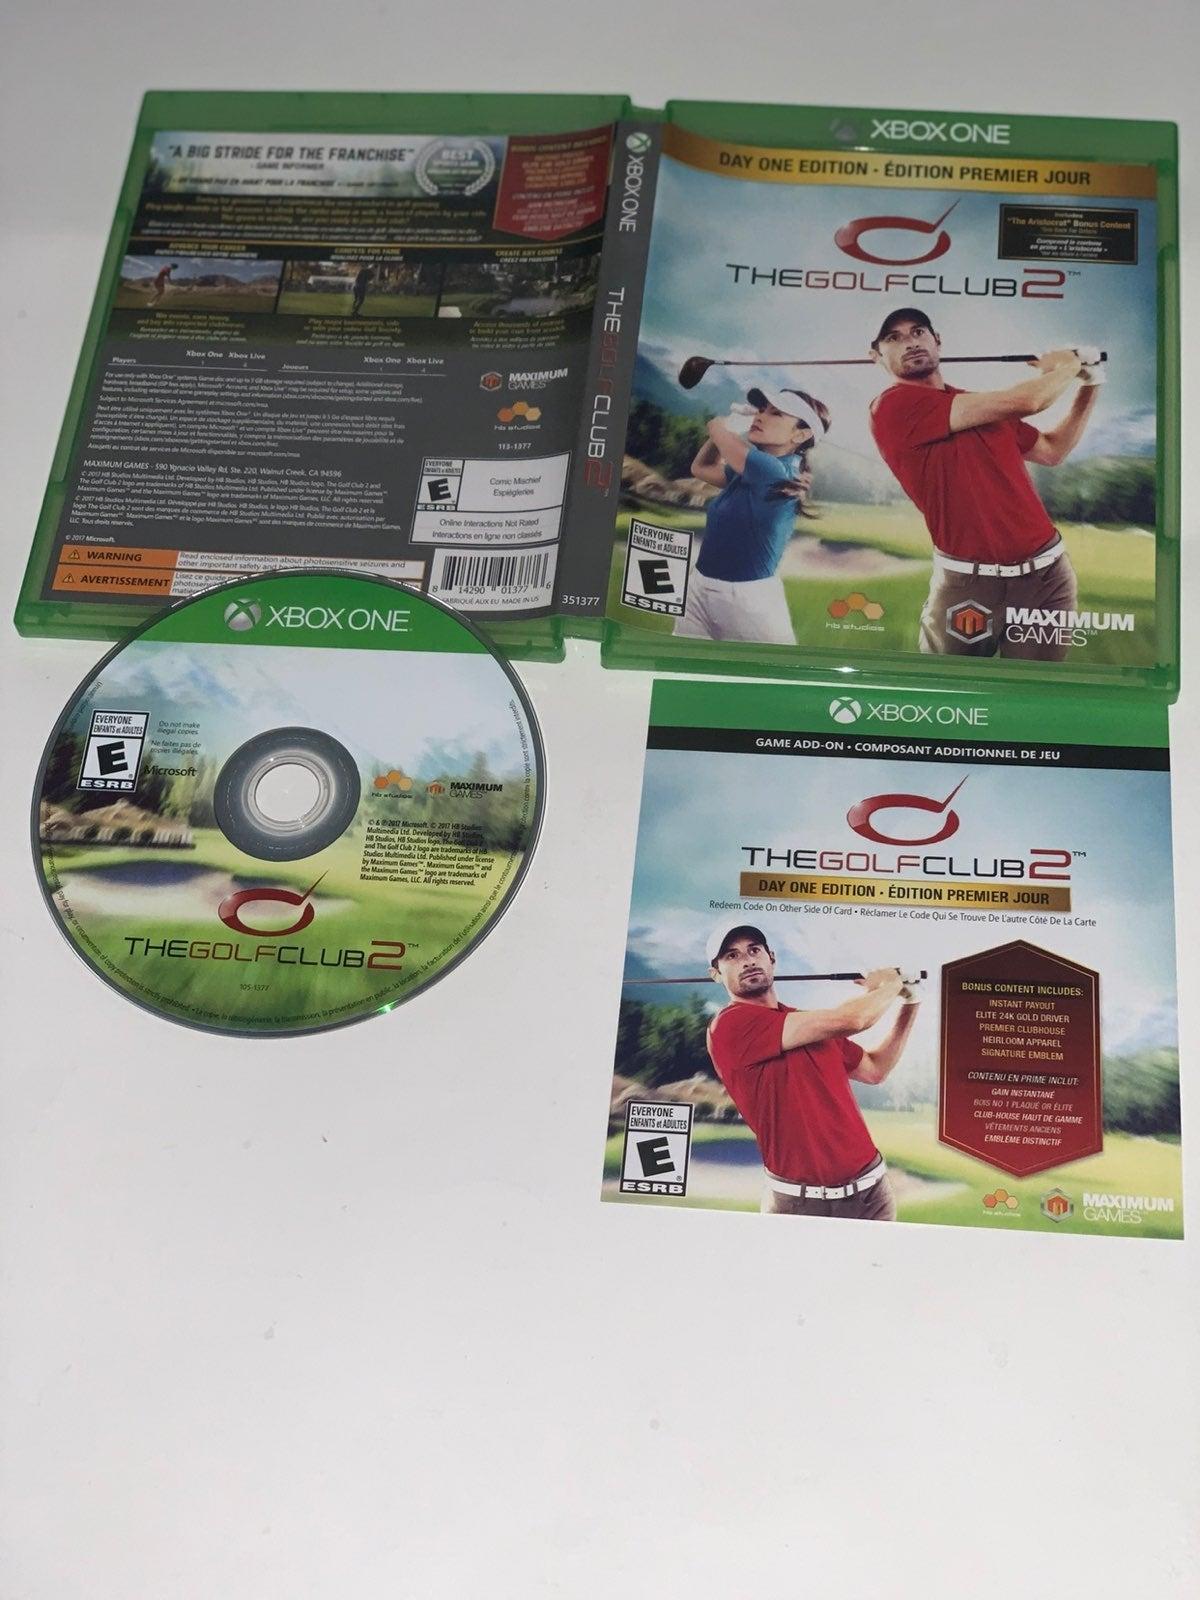 XBOX One The Golf Club 2 Day One Edition